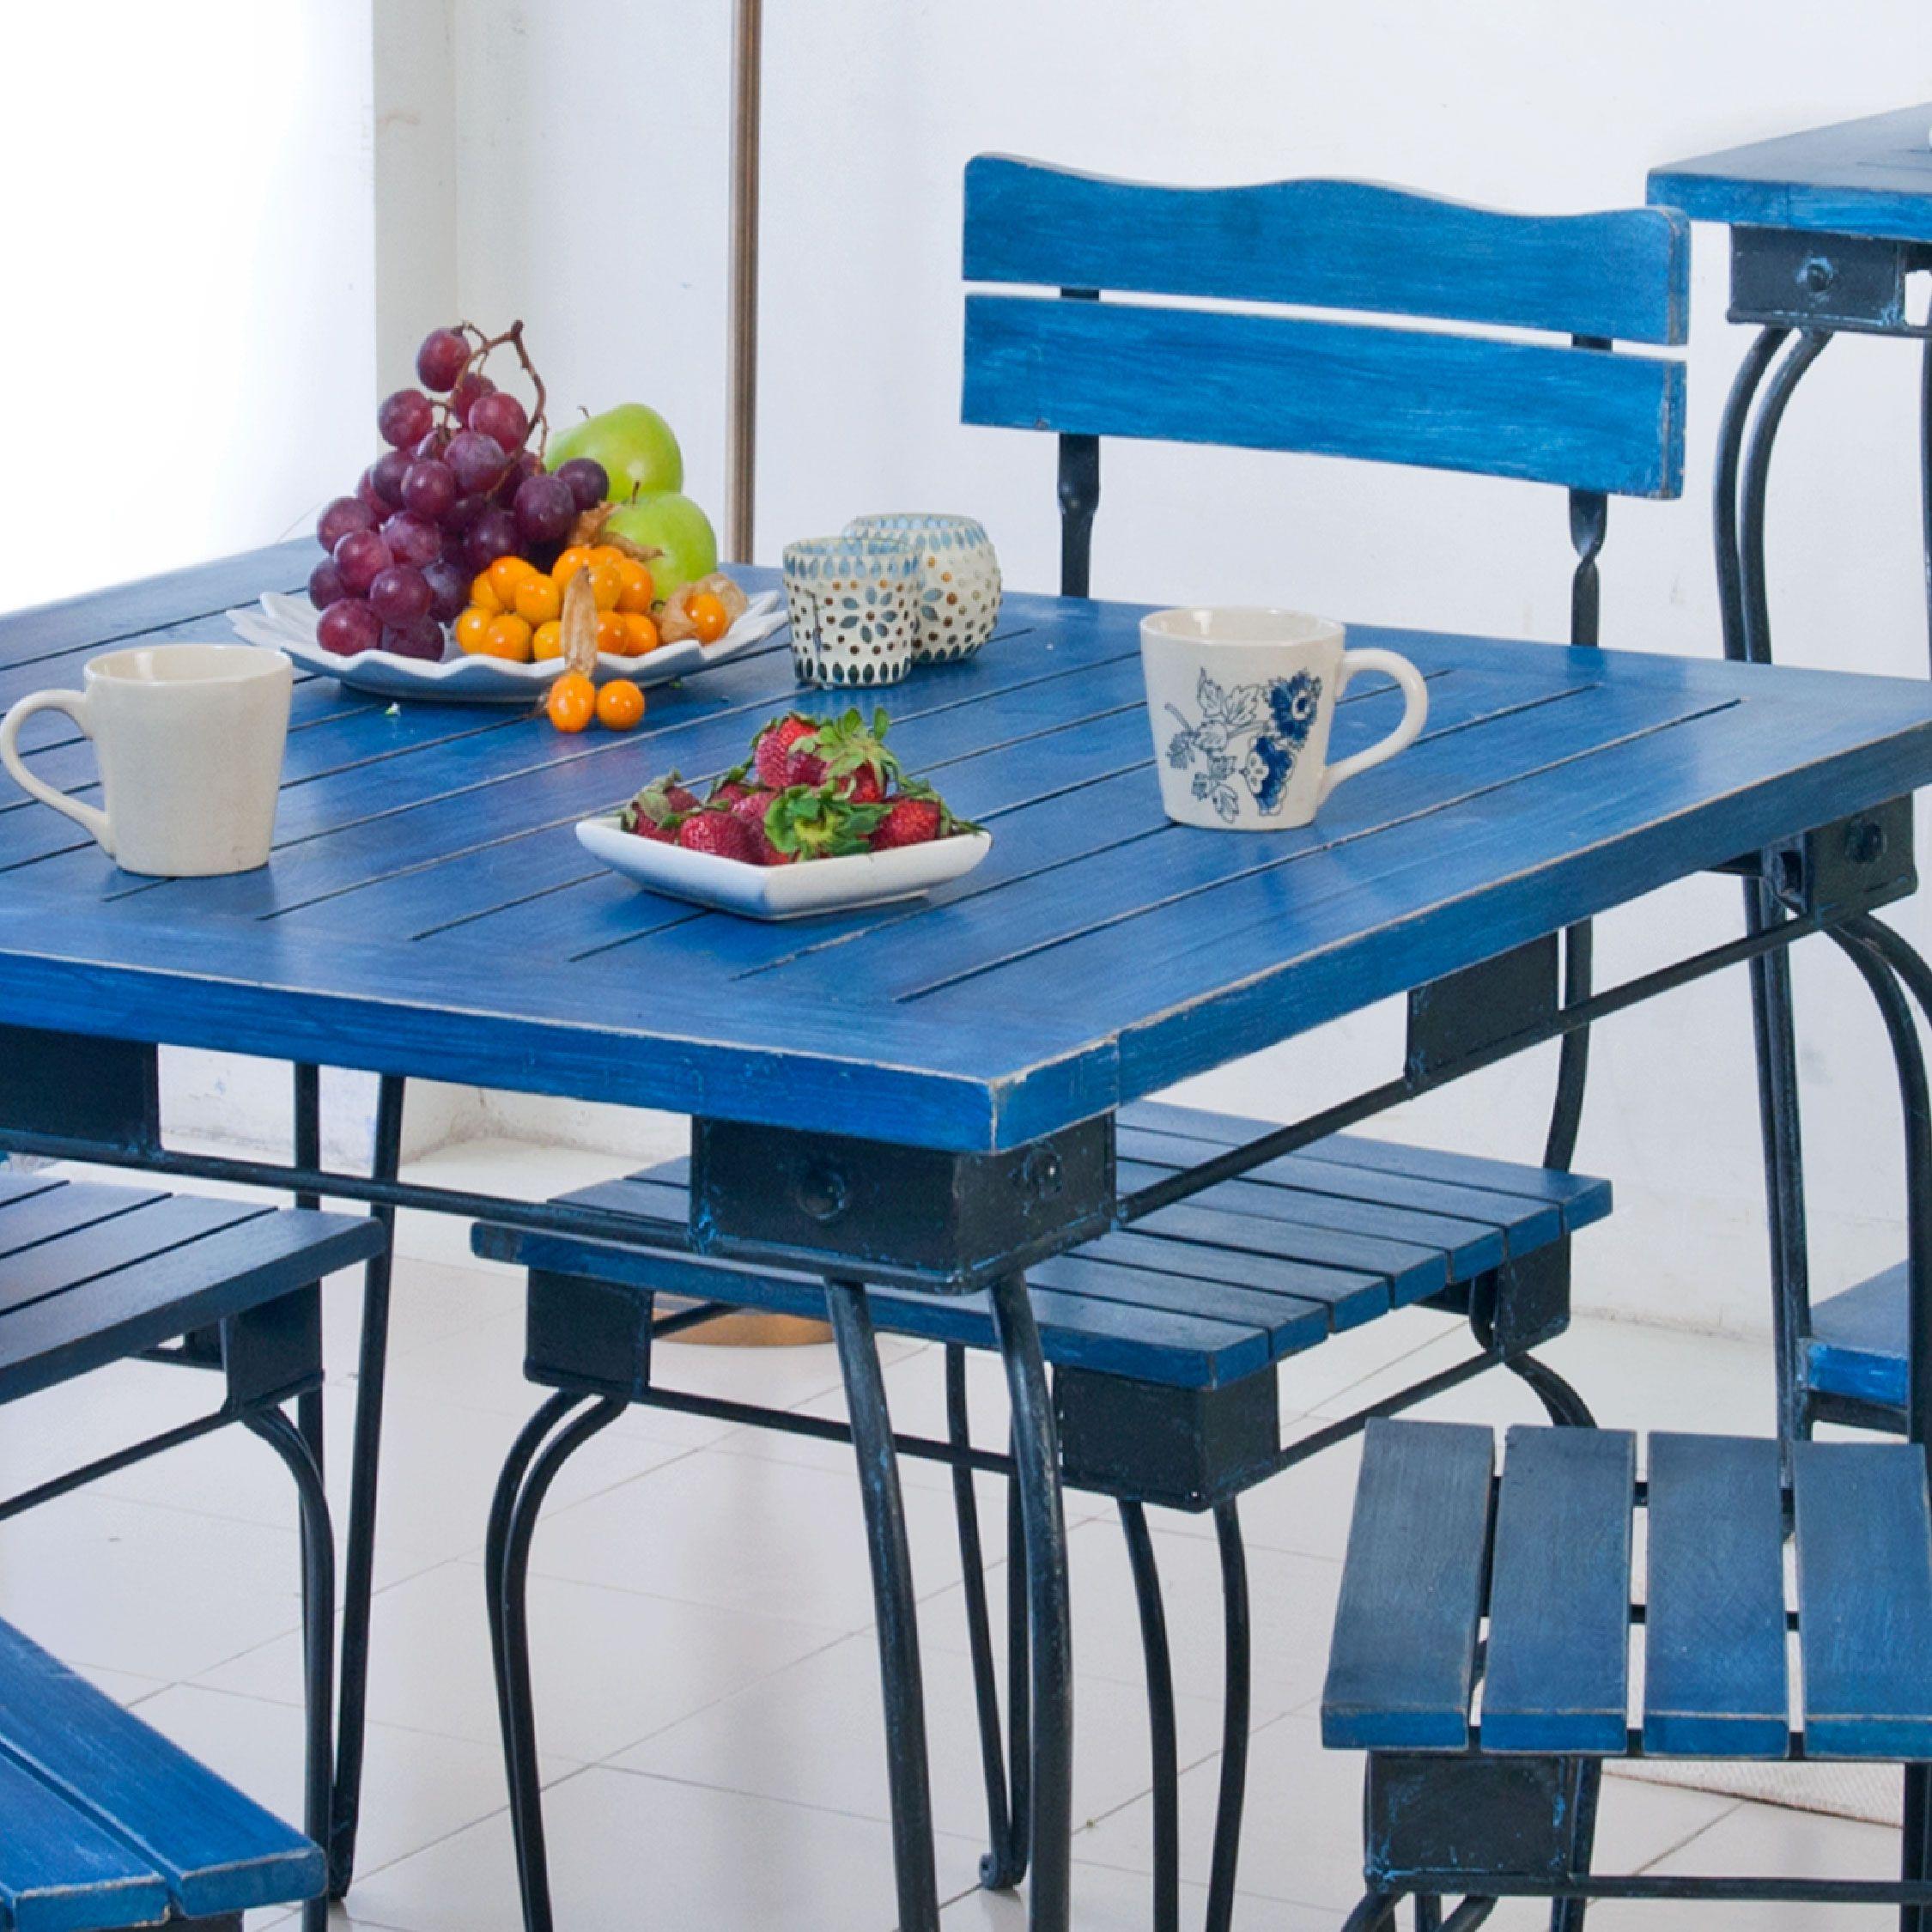 #dining #table #wood #furniture #blue #Mediterranean #ceramic #mugs